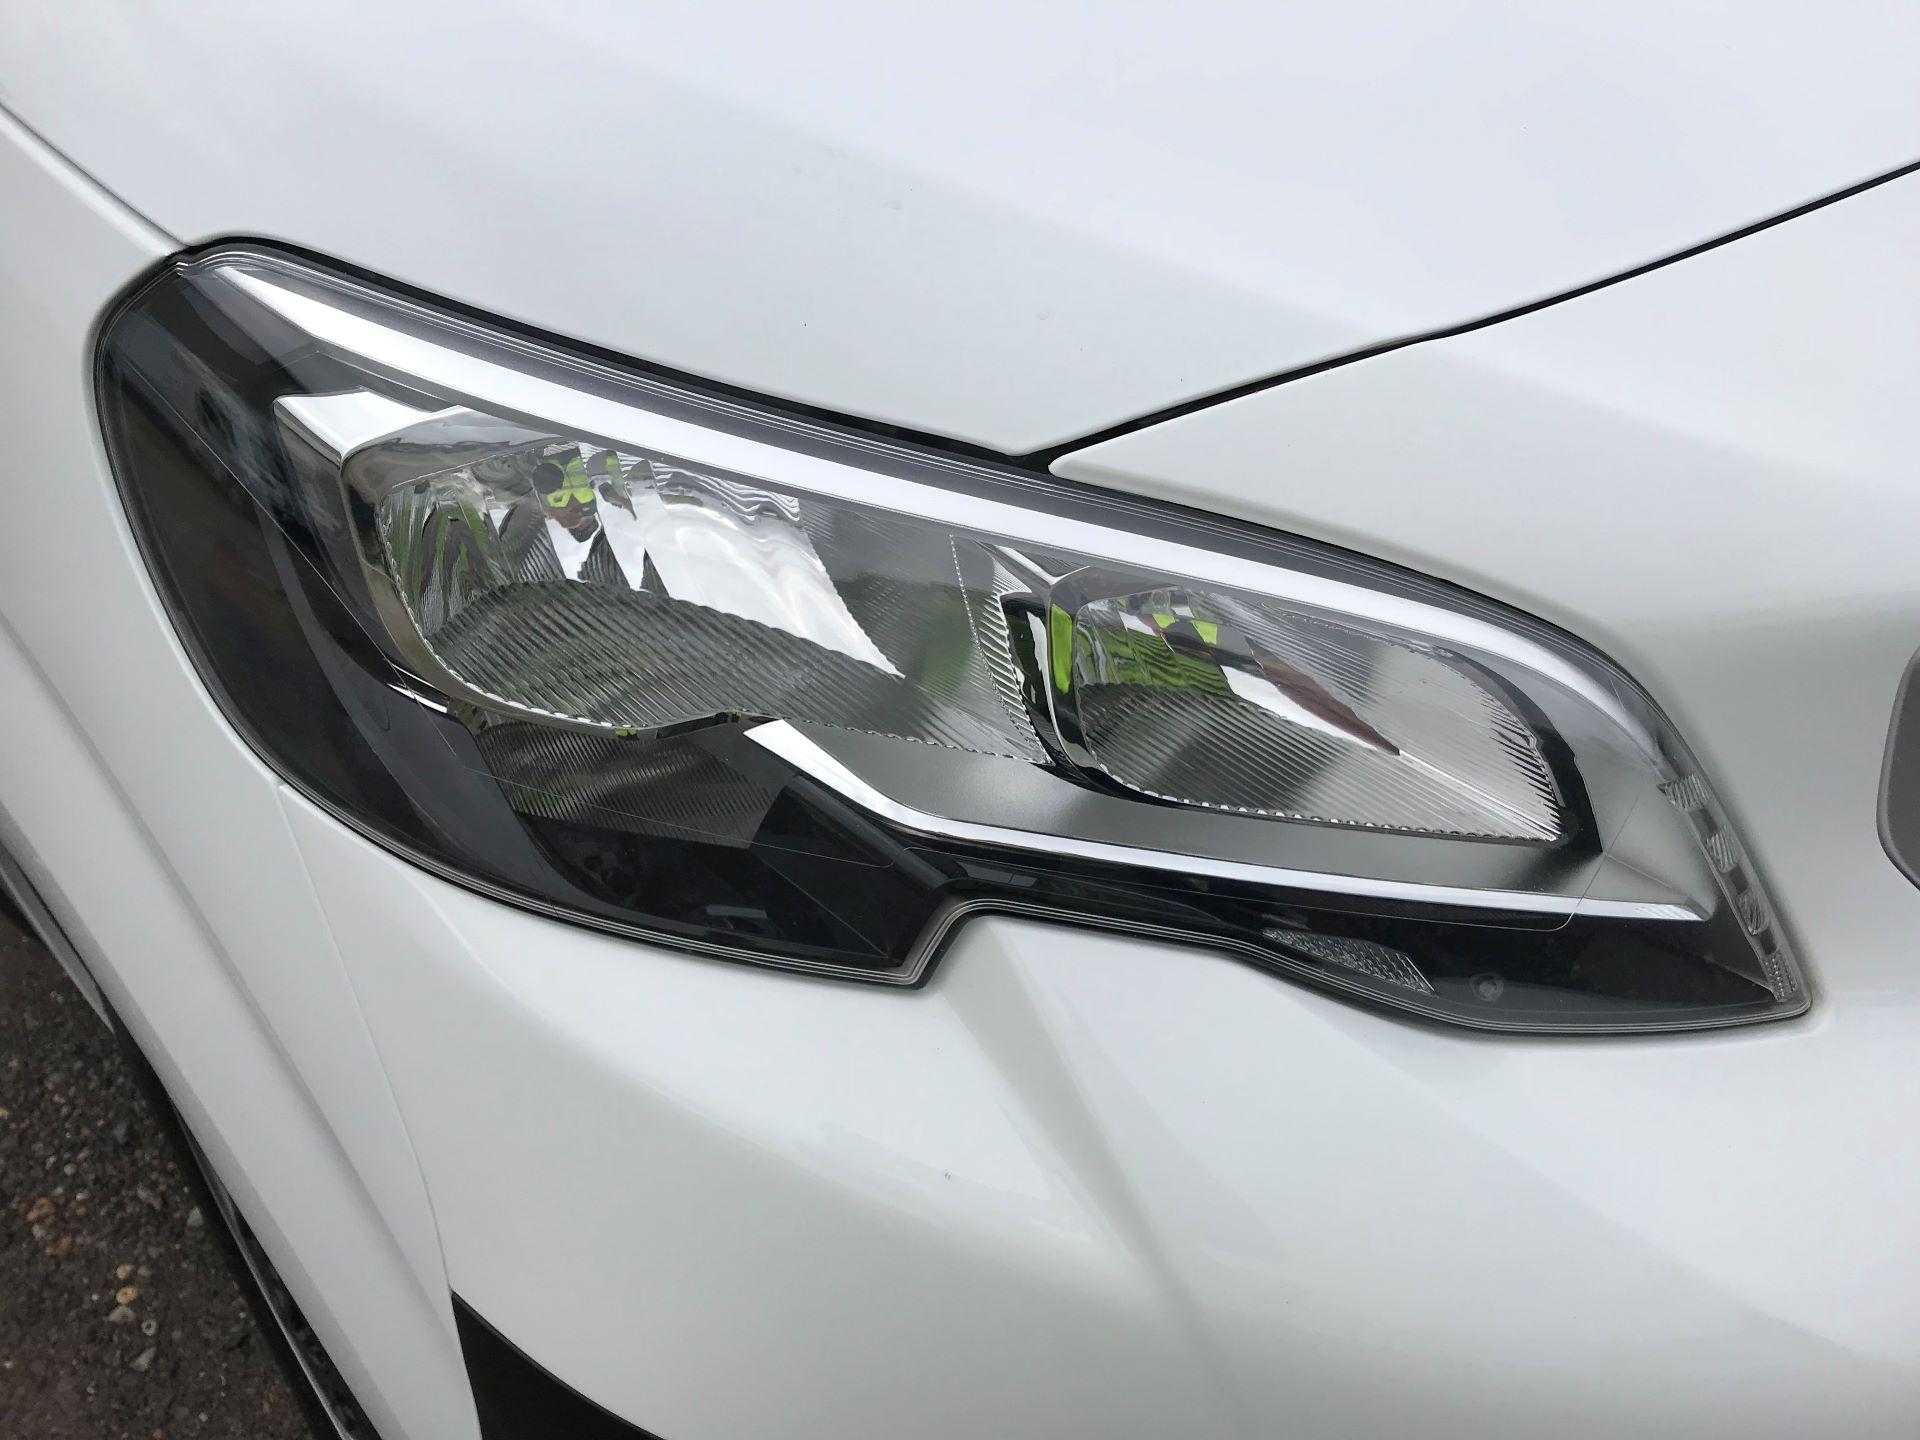 2018 Peugeot Expert STANDARD 1000 1.6 BLUEHDI 95 PROFESSIONAL EURO 6 (NU18VXL) Image 32